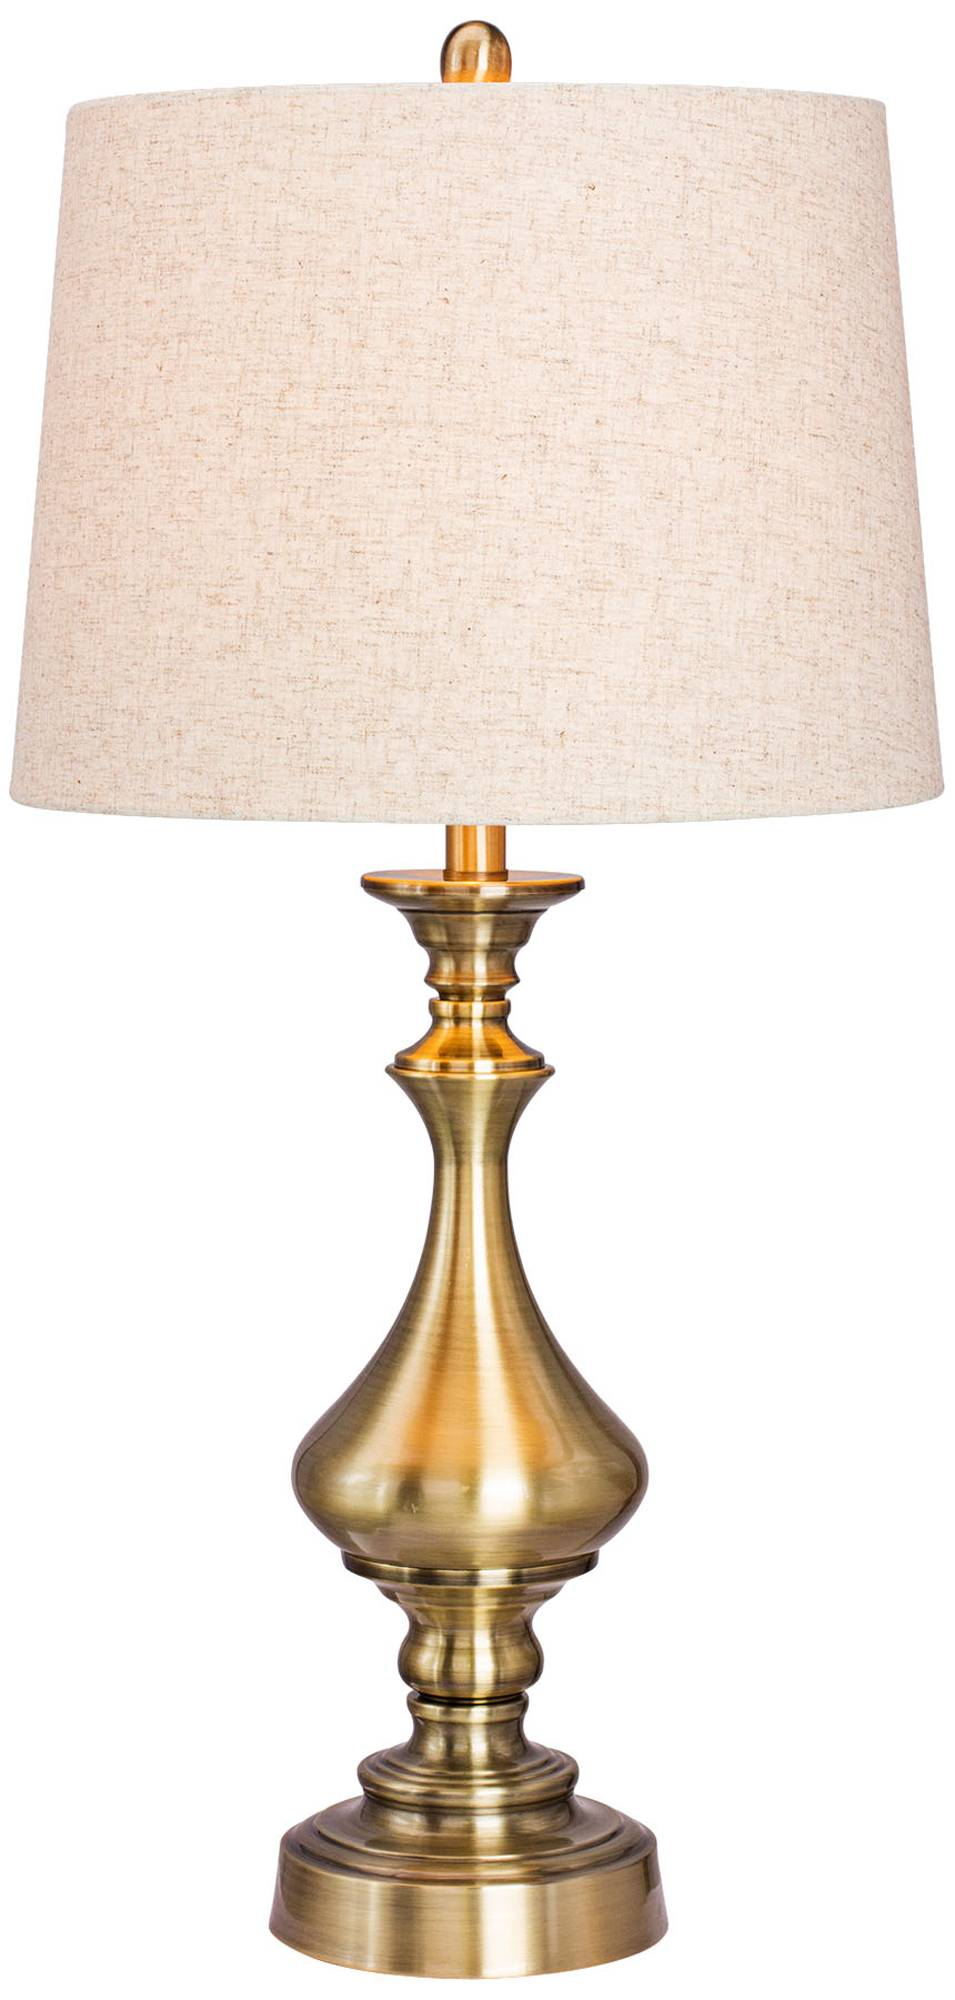 Rainbow Desert Southwest Candlestick Table Lamp 3n810